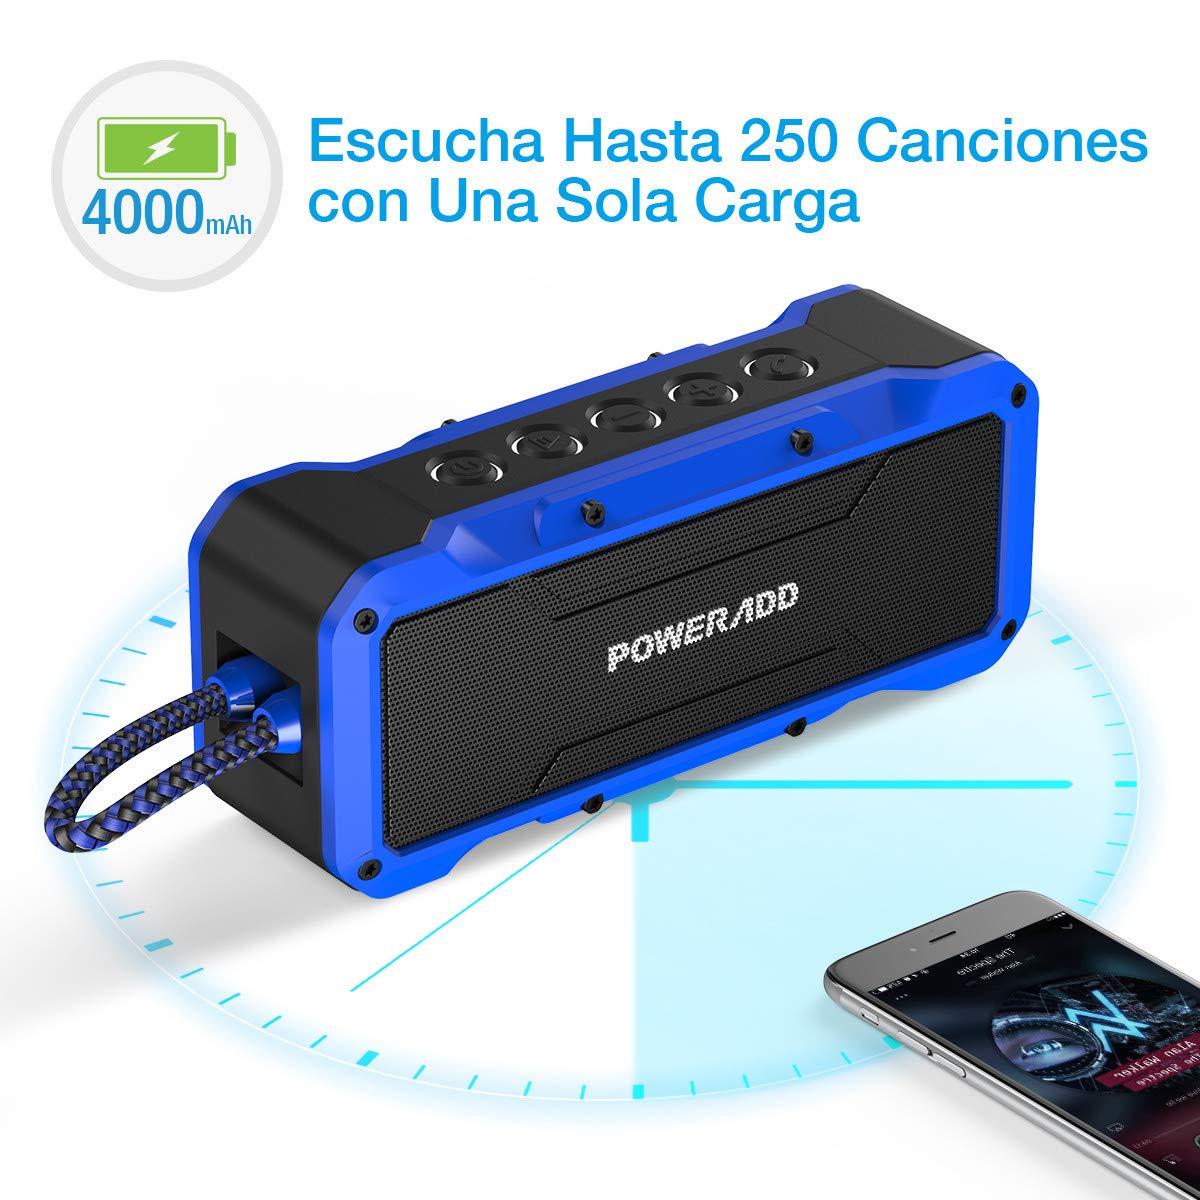 POWERADD Altavoz Sonido Potente de 36W, Altavoz Bluetooth Portátil de Impermeable IPX7,Antigolpes,Resisdente a Arena, con Aux Cable,Color Negro-Azul.